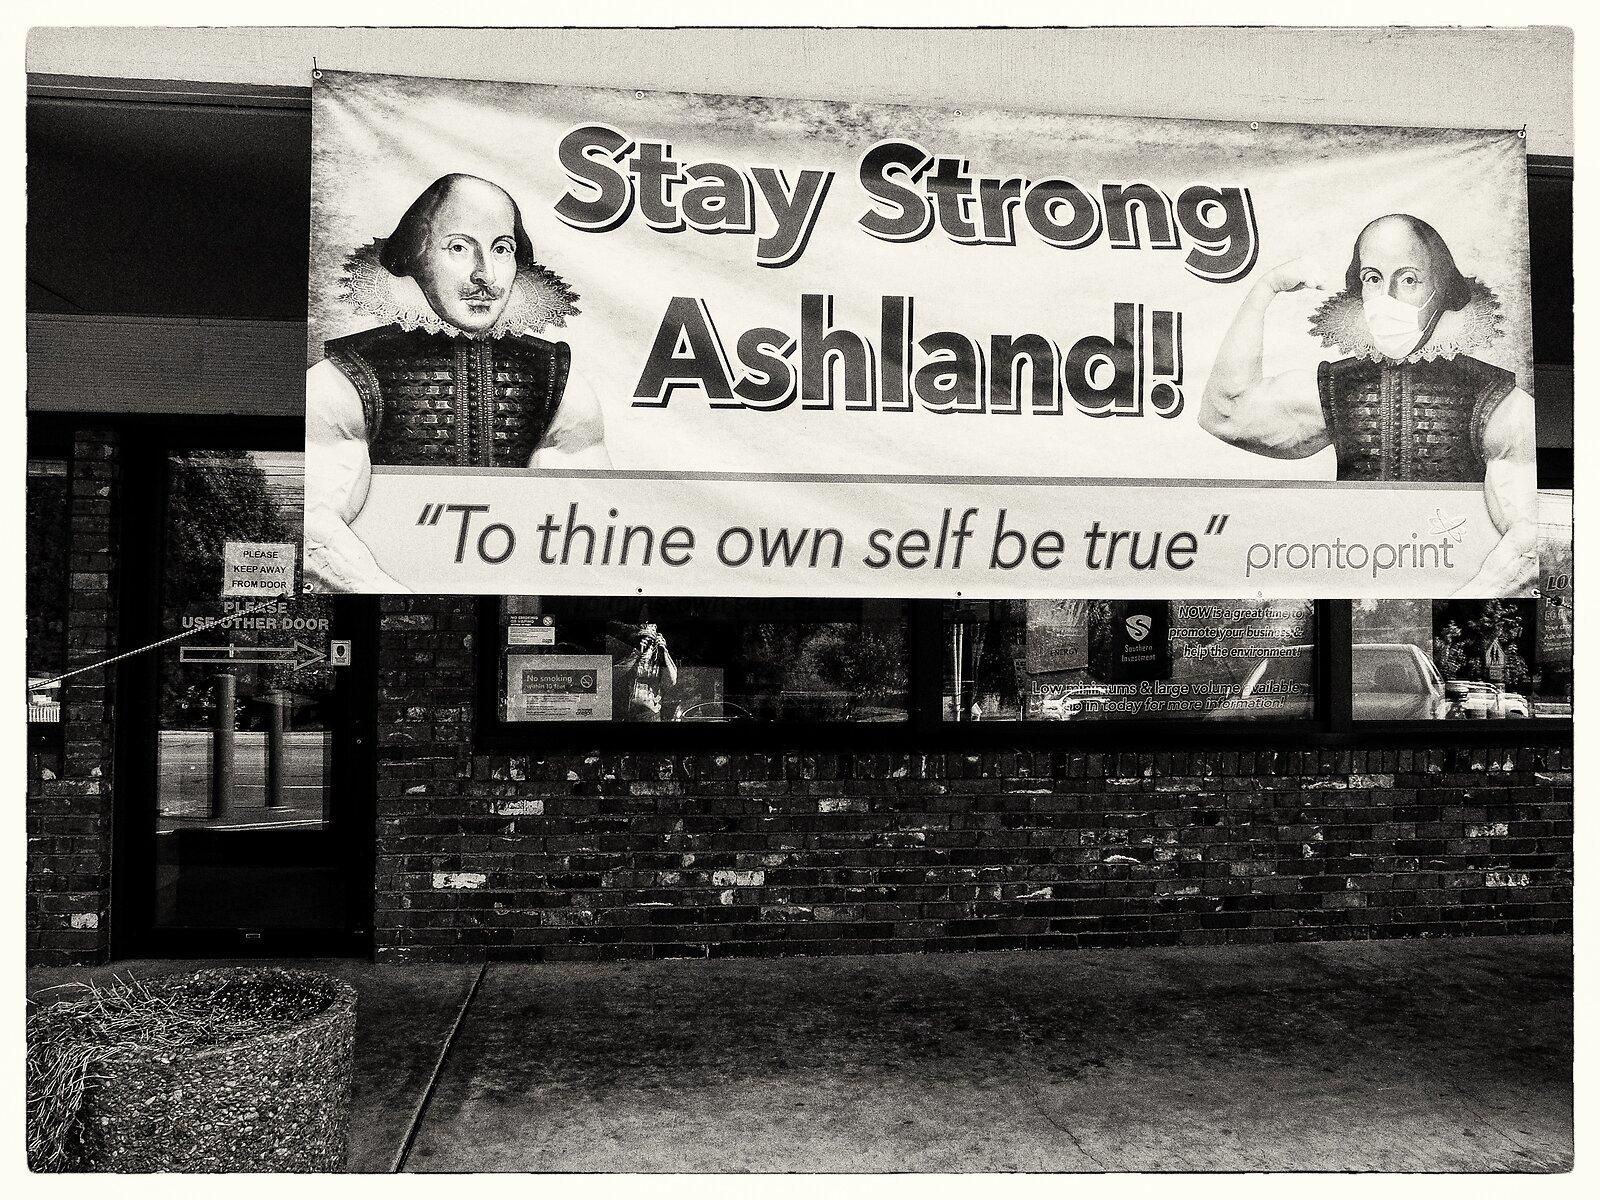 X30_July22_Stay_Strong_Ashland.jpg